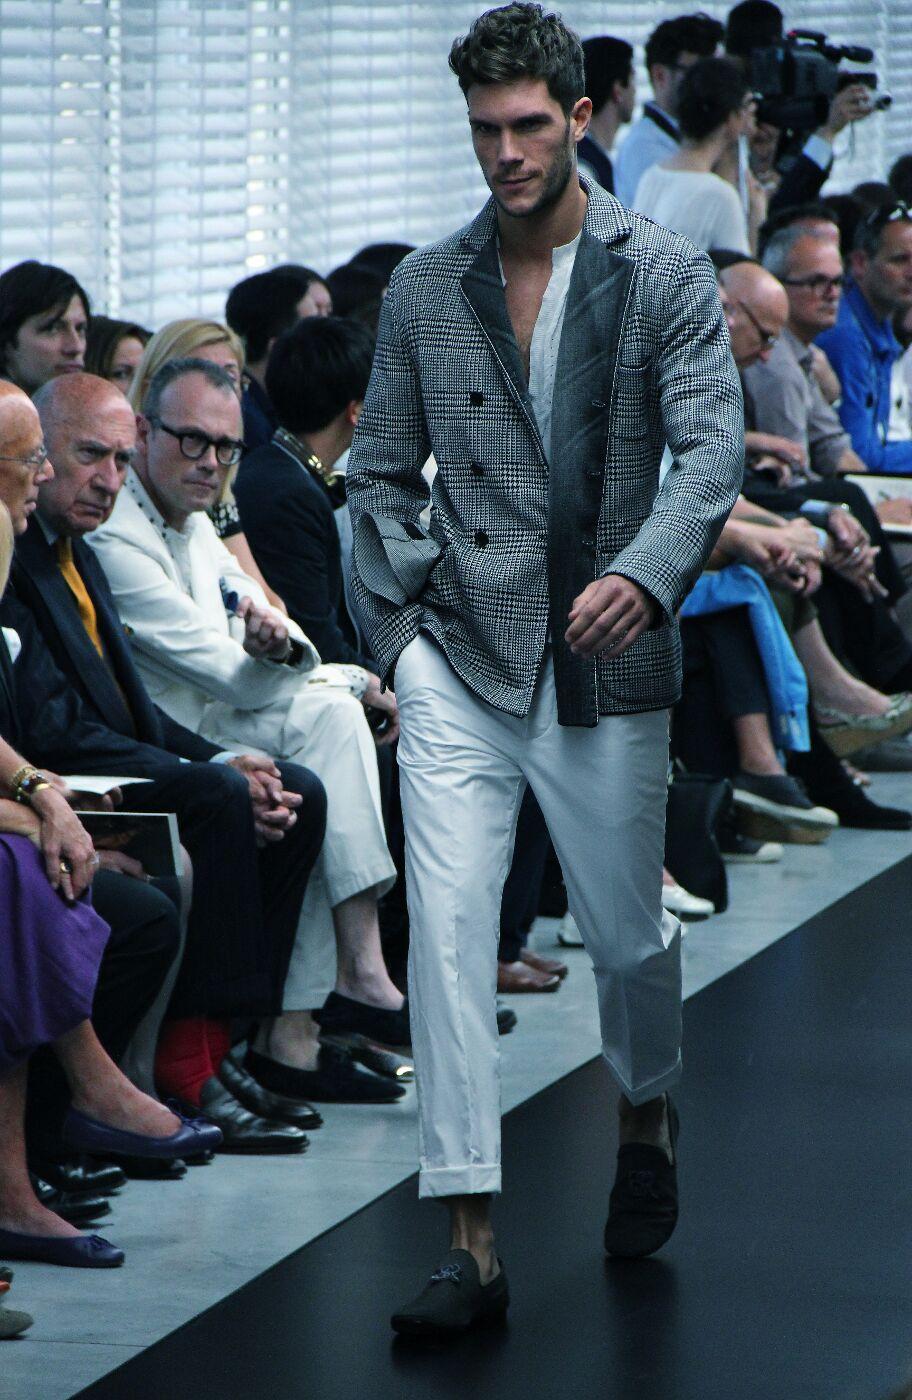 ermanno-scervino-spring-summer-2012-men-collection-milano-fashion-week-2012-ermanno-scervino-primavera-estate-fashion-show-catwalk